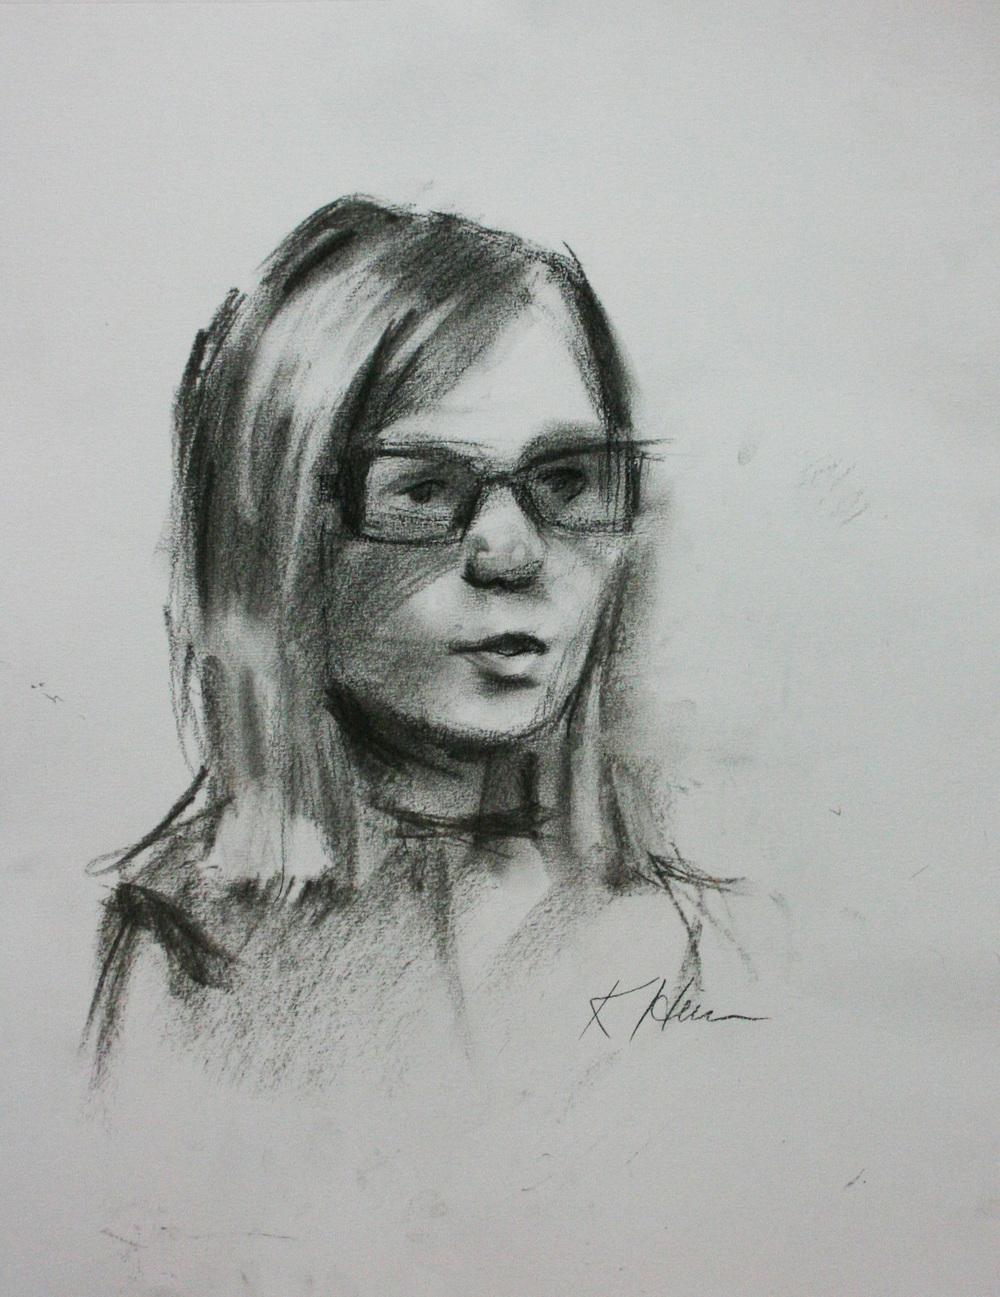 Kathryn Heim did this 15 minute sketch.